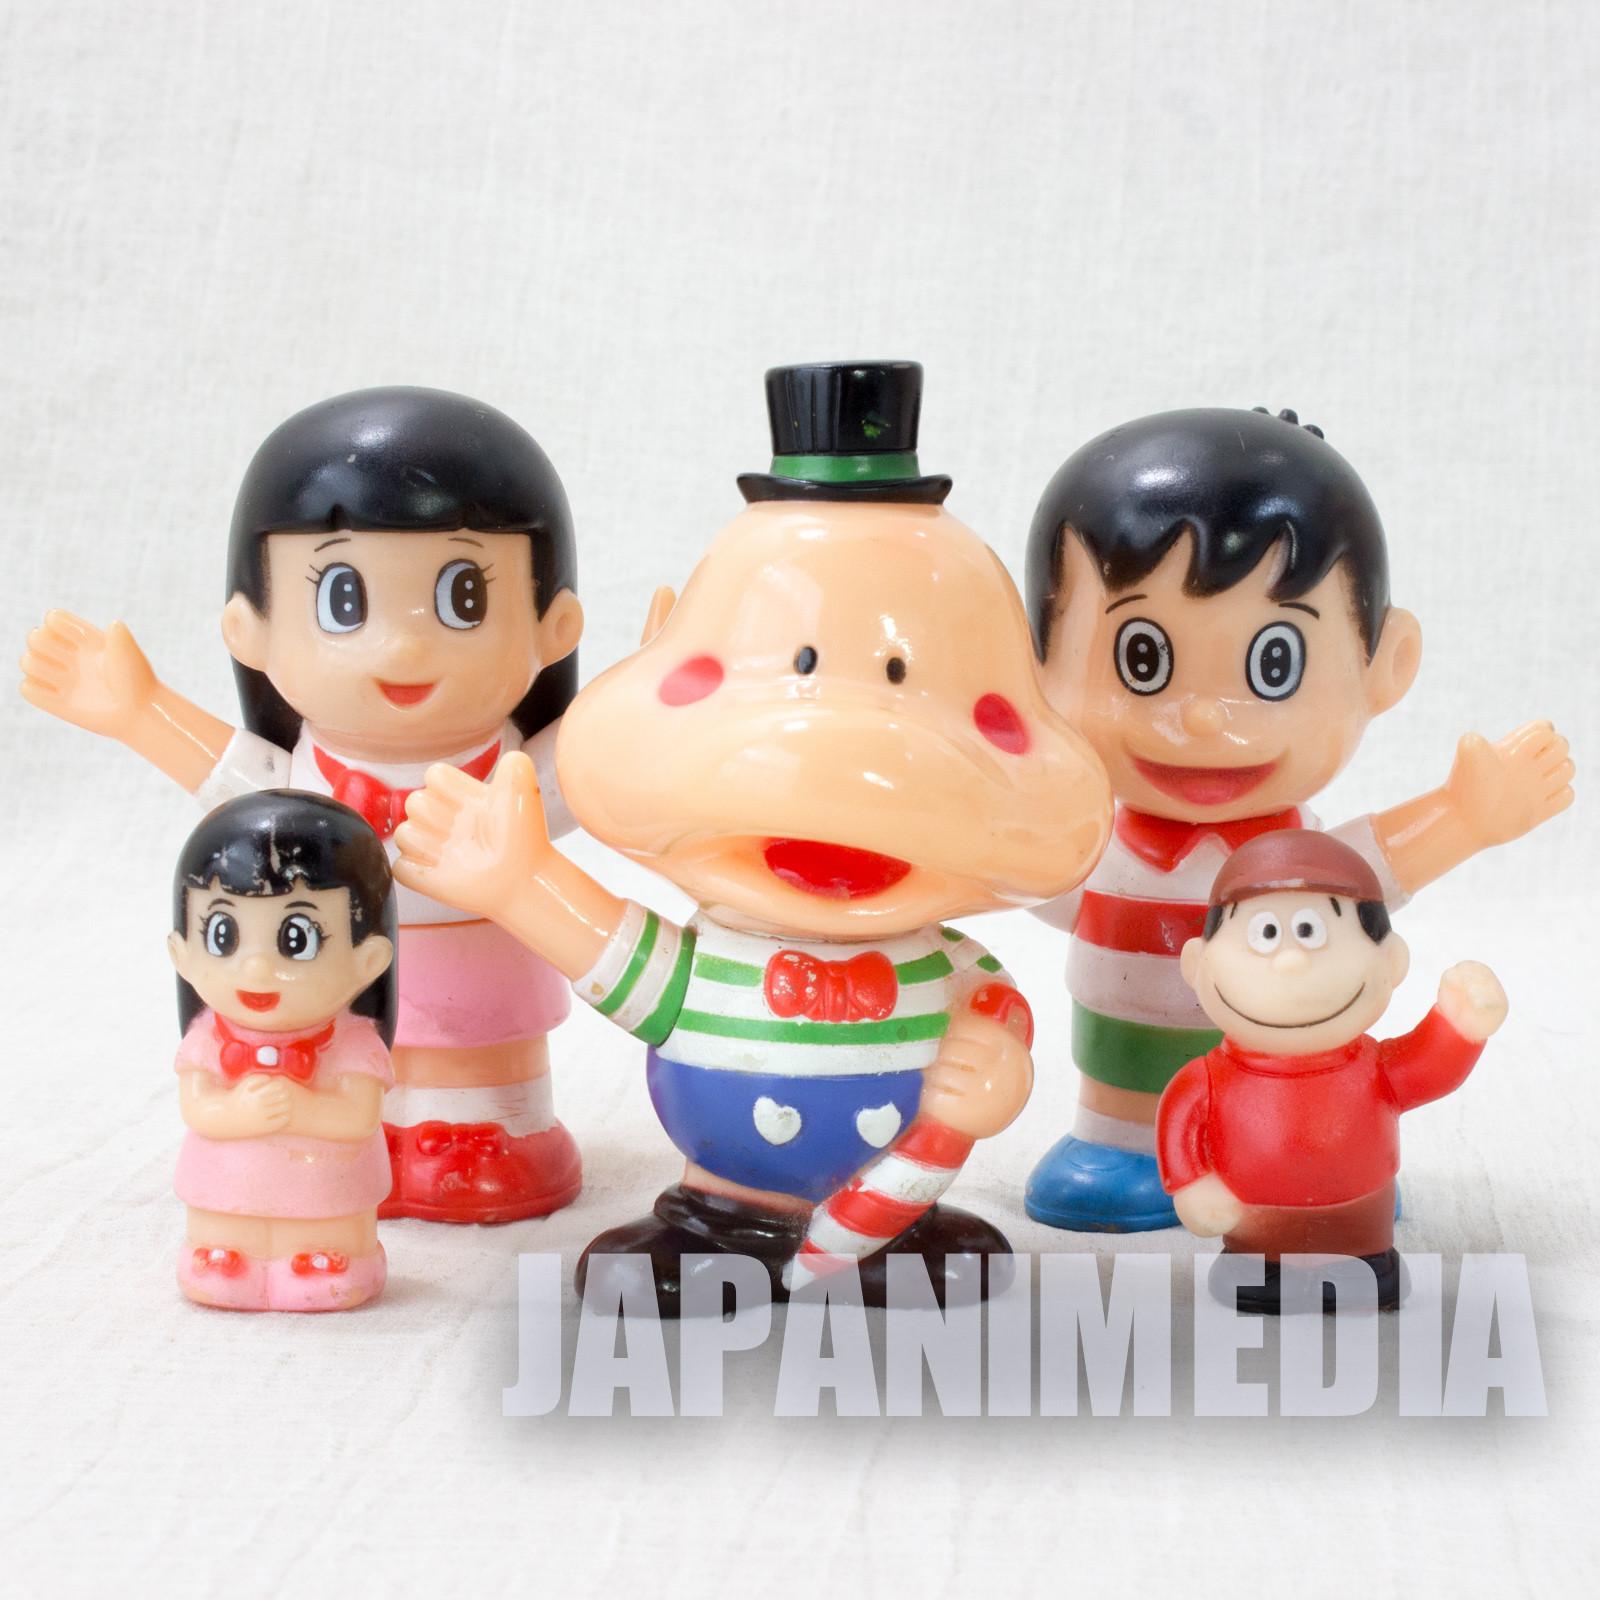 Retro RARE! Parasol Henbee Soft Vinyl Figure Set Fujiko A. Fujio JAPAN ANIME